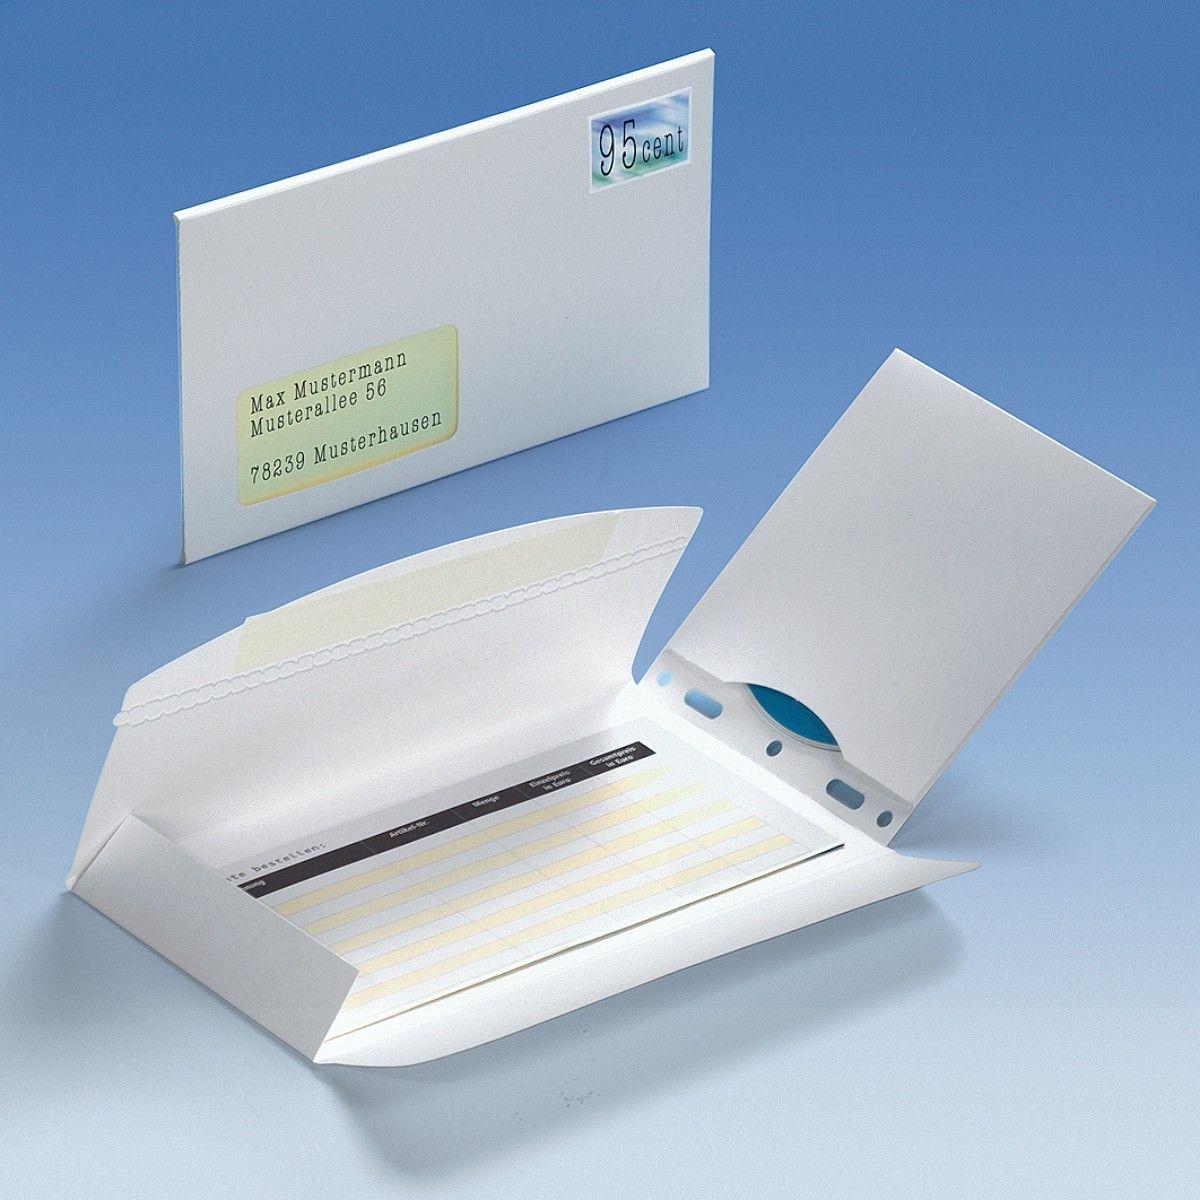 discmail cd24 cd versandtasche aus karton mit fenster clickbox world of boxes. Black Bedroom Furniture Sets. Home Design Ideas